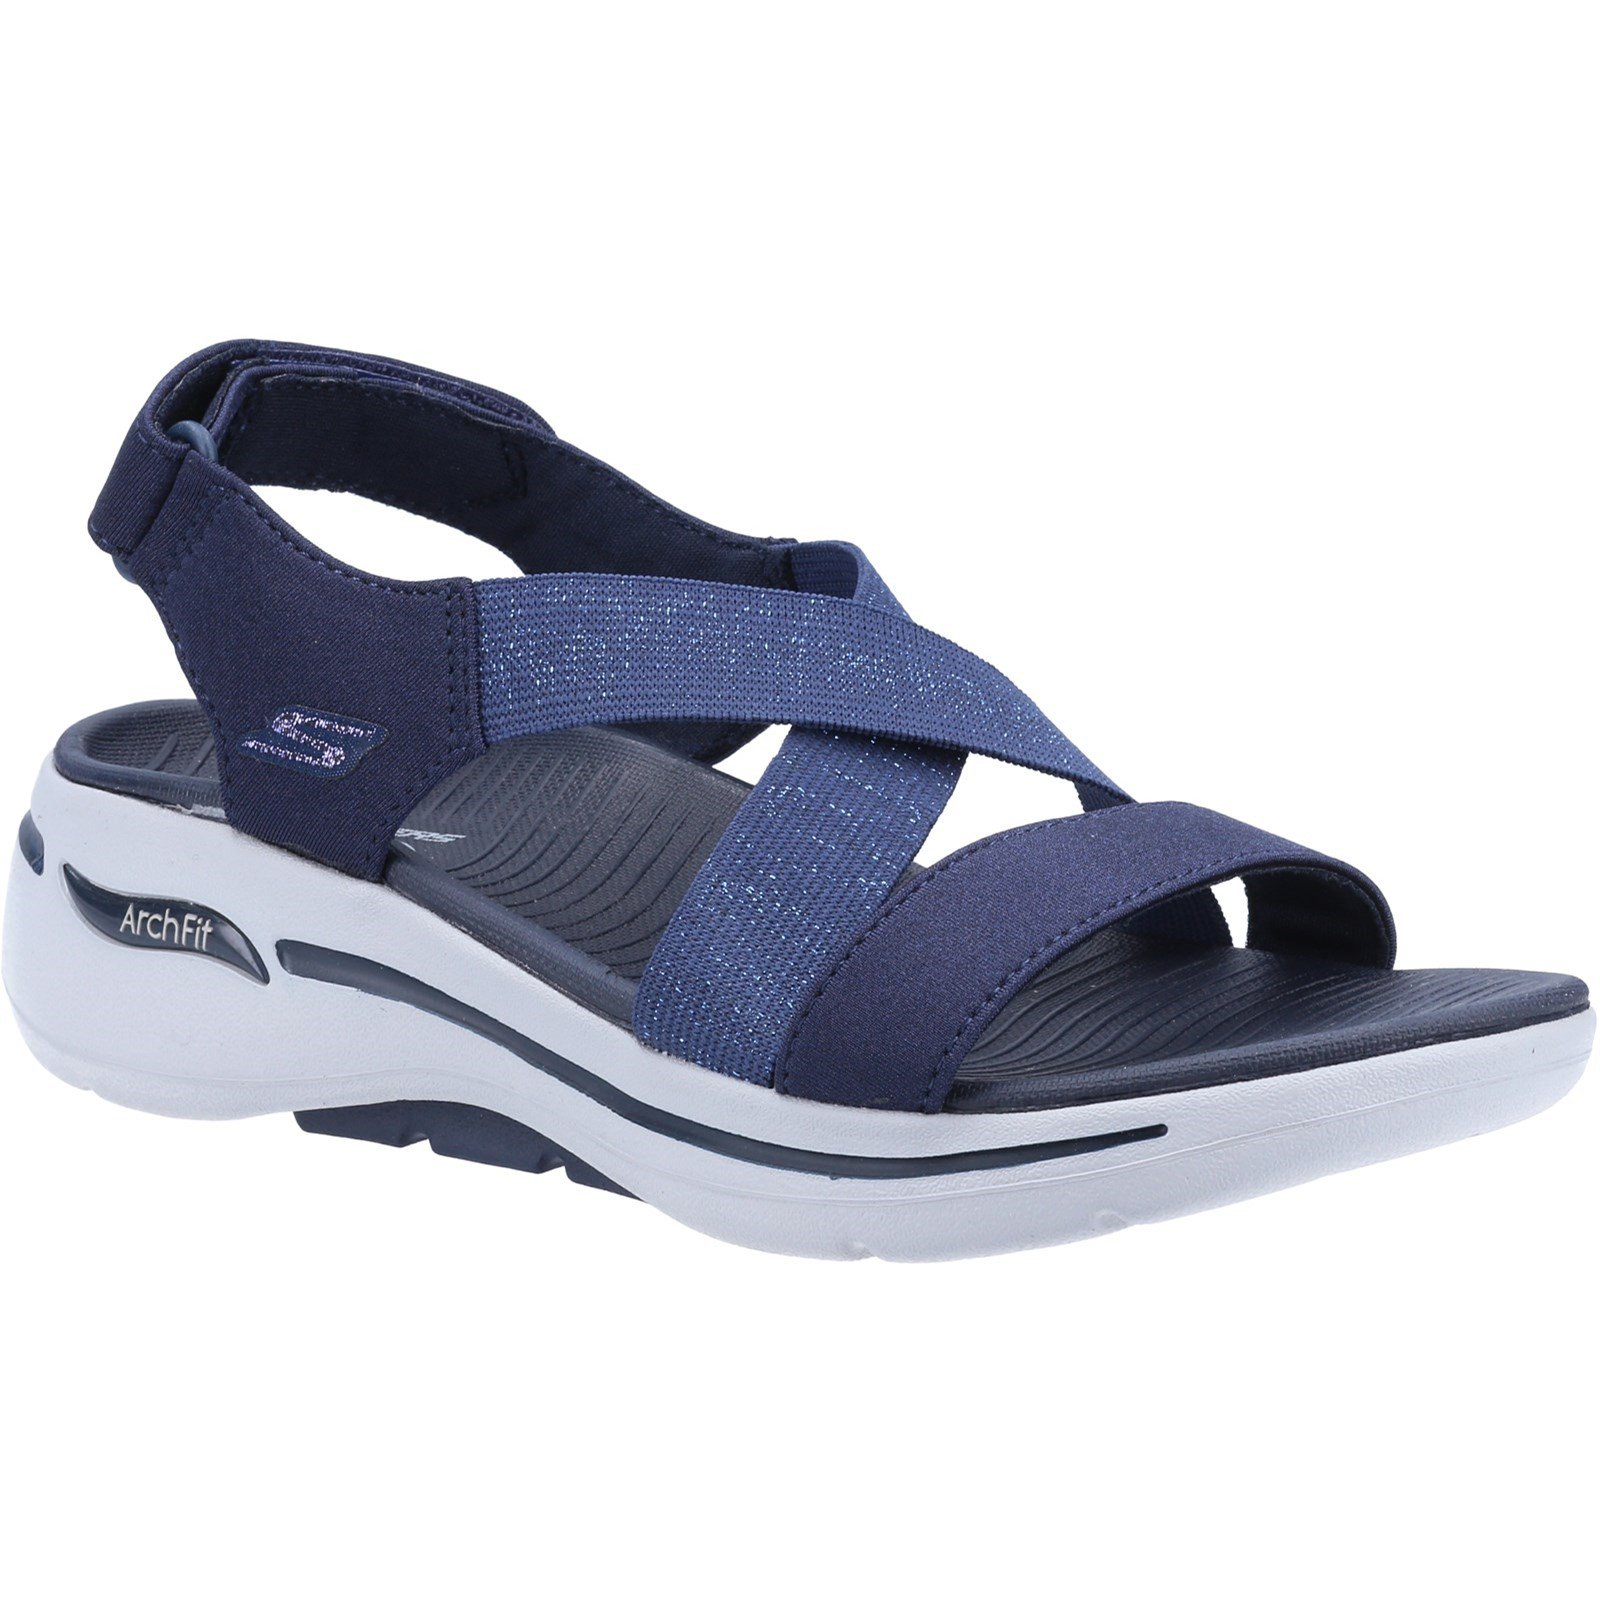 Skechers Women's Go Walk Arch Fit Astonish Summer Sandal Various Colours 32153 - Navy 8